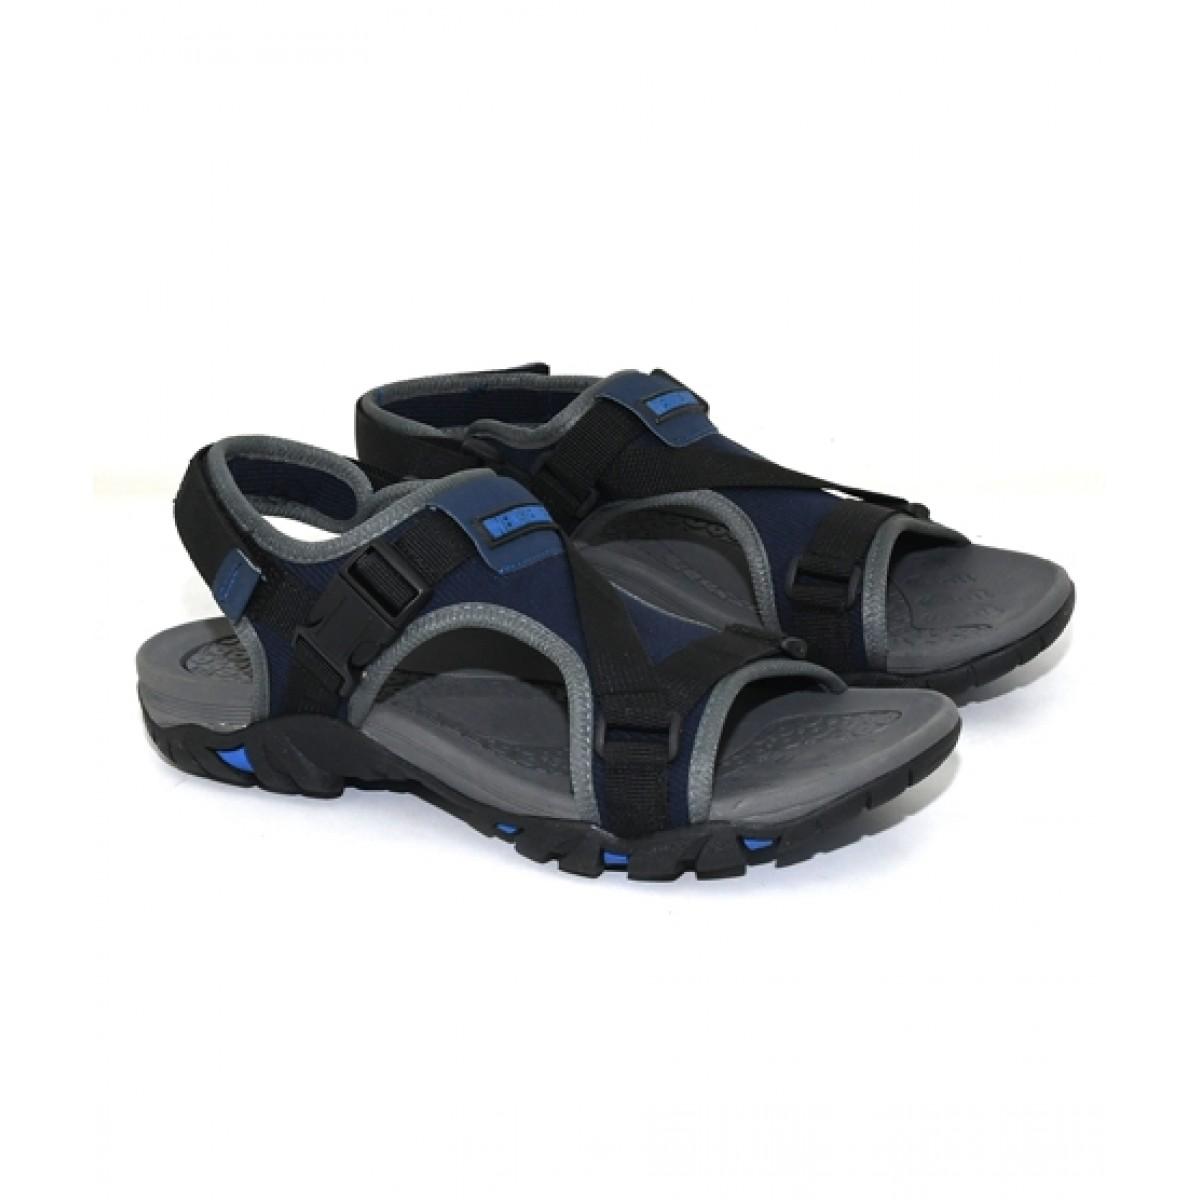 b856f129a Bata Synthetic Sandal Men dark Blue Price in Pakistan | Buy Bata Synthetic  Sandal Men (861-9897) | iShopping.pk